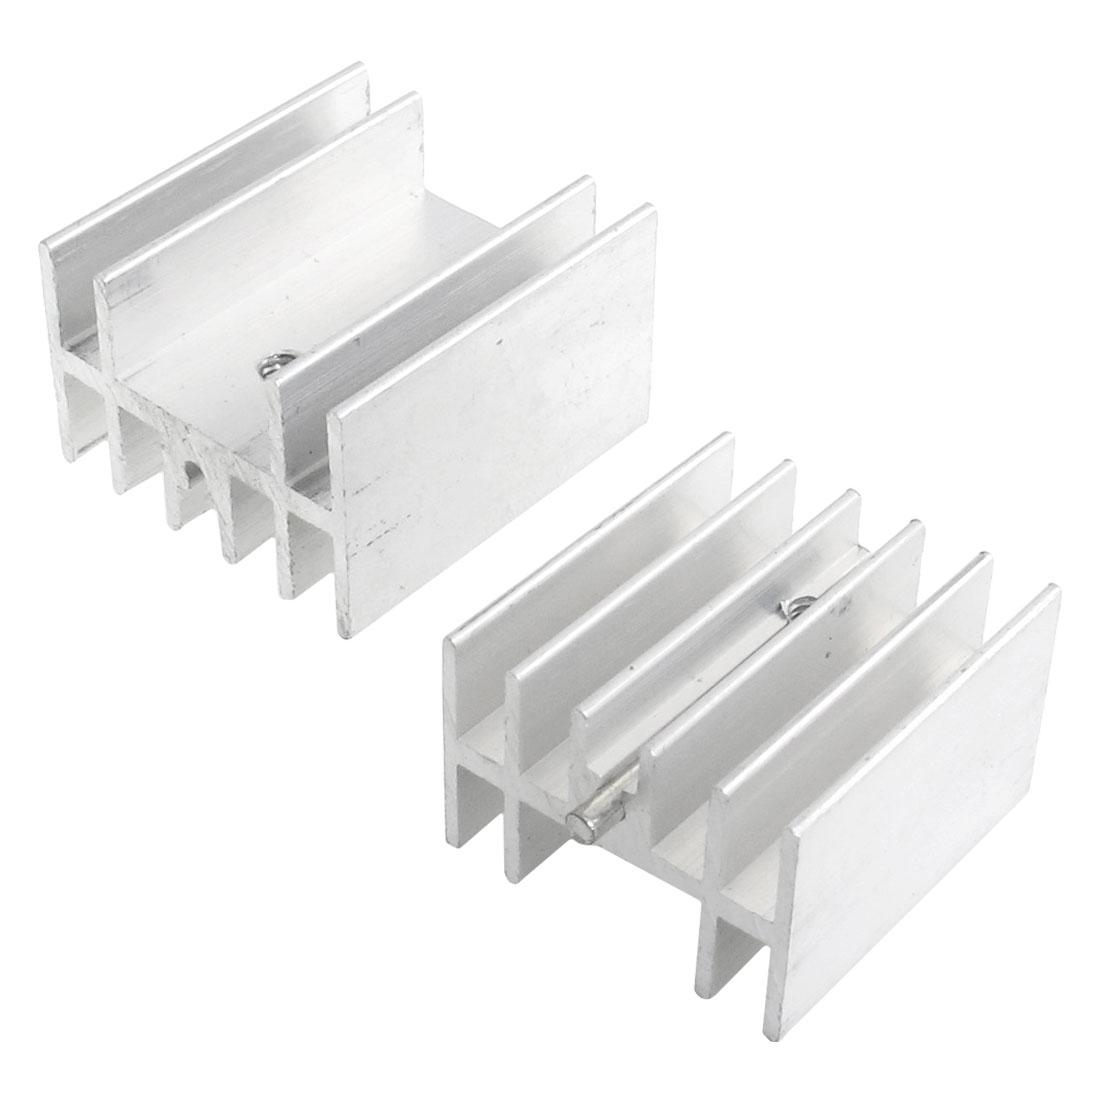 2 Pcs 23.5x16x25mm Heatsink Heat Diffuse Aluminium Cooling Fin